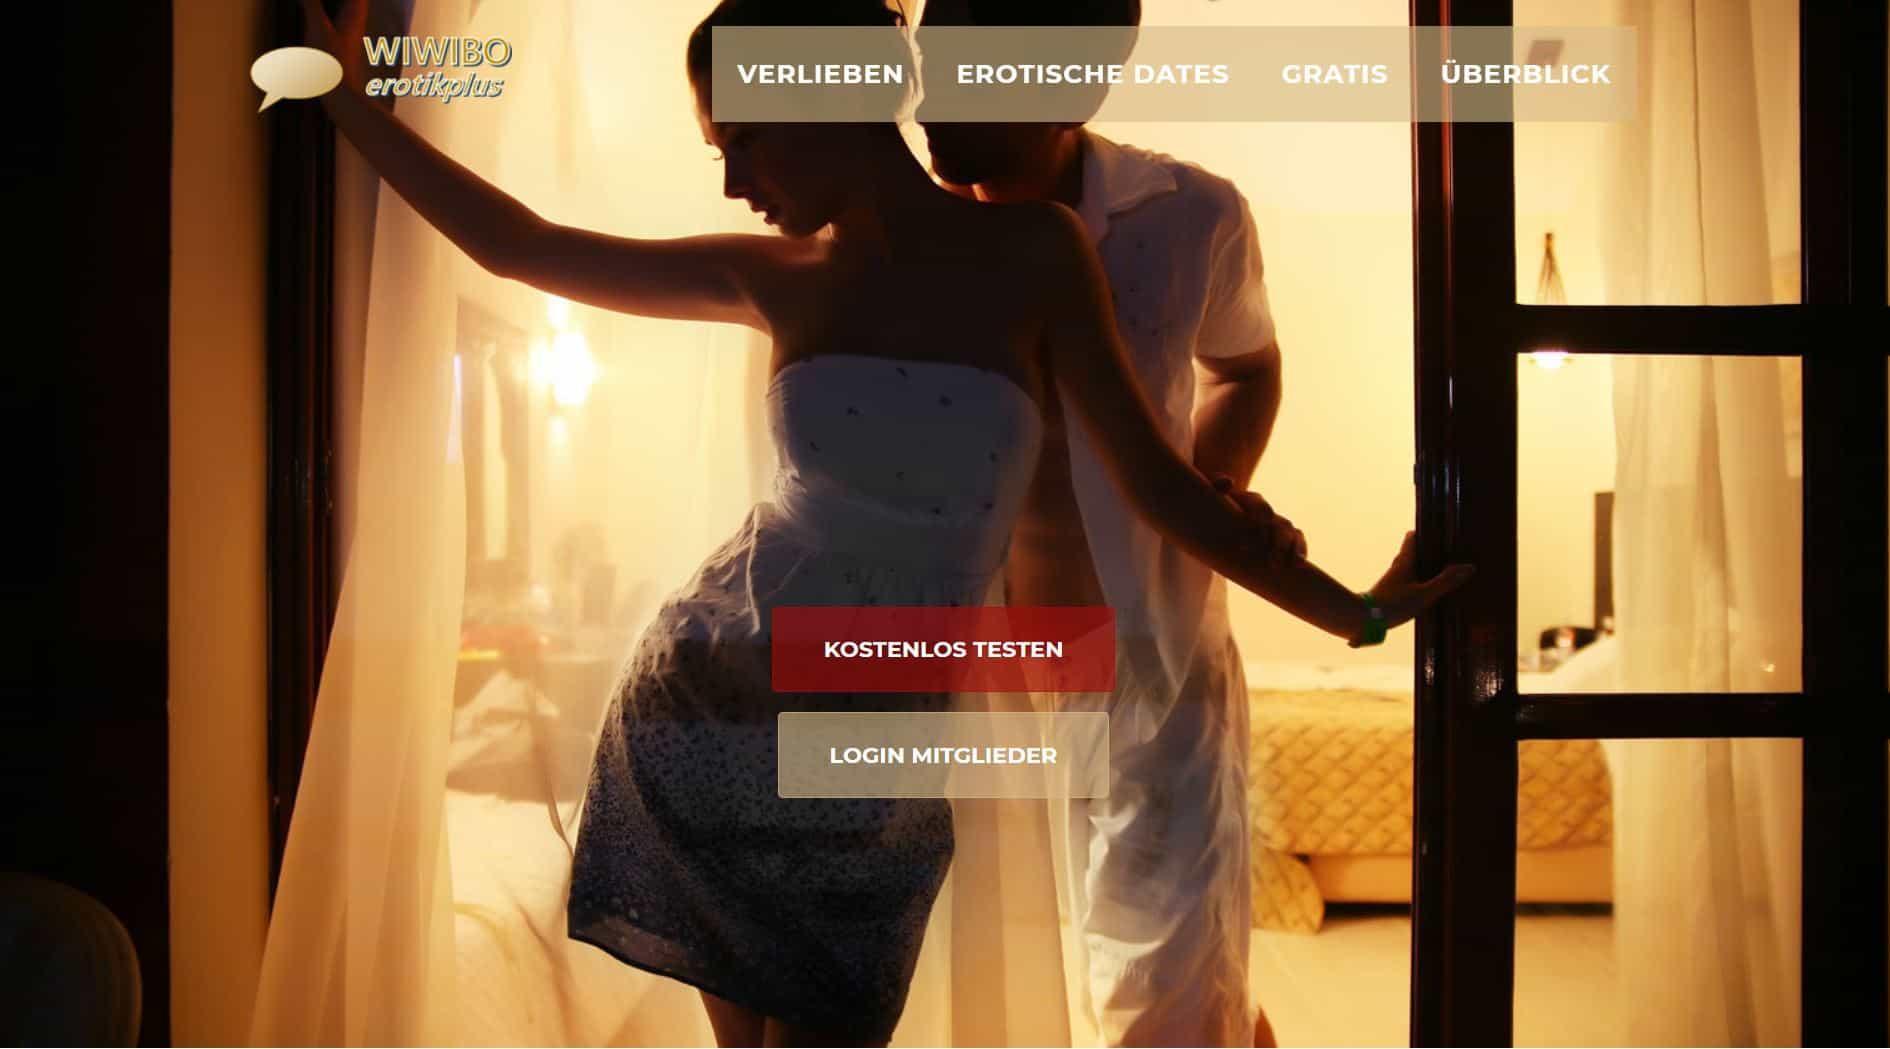 Testbericht - erotikplus.net Abzocke